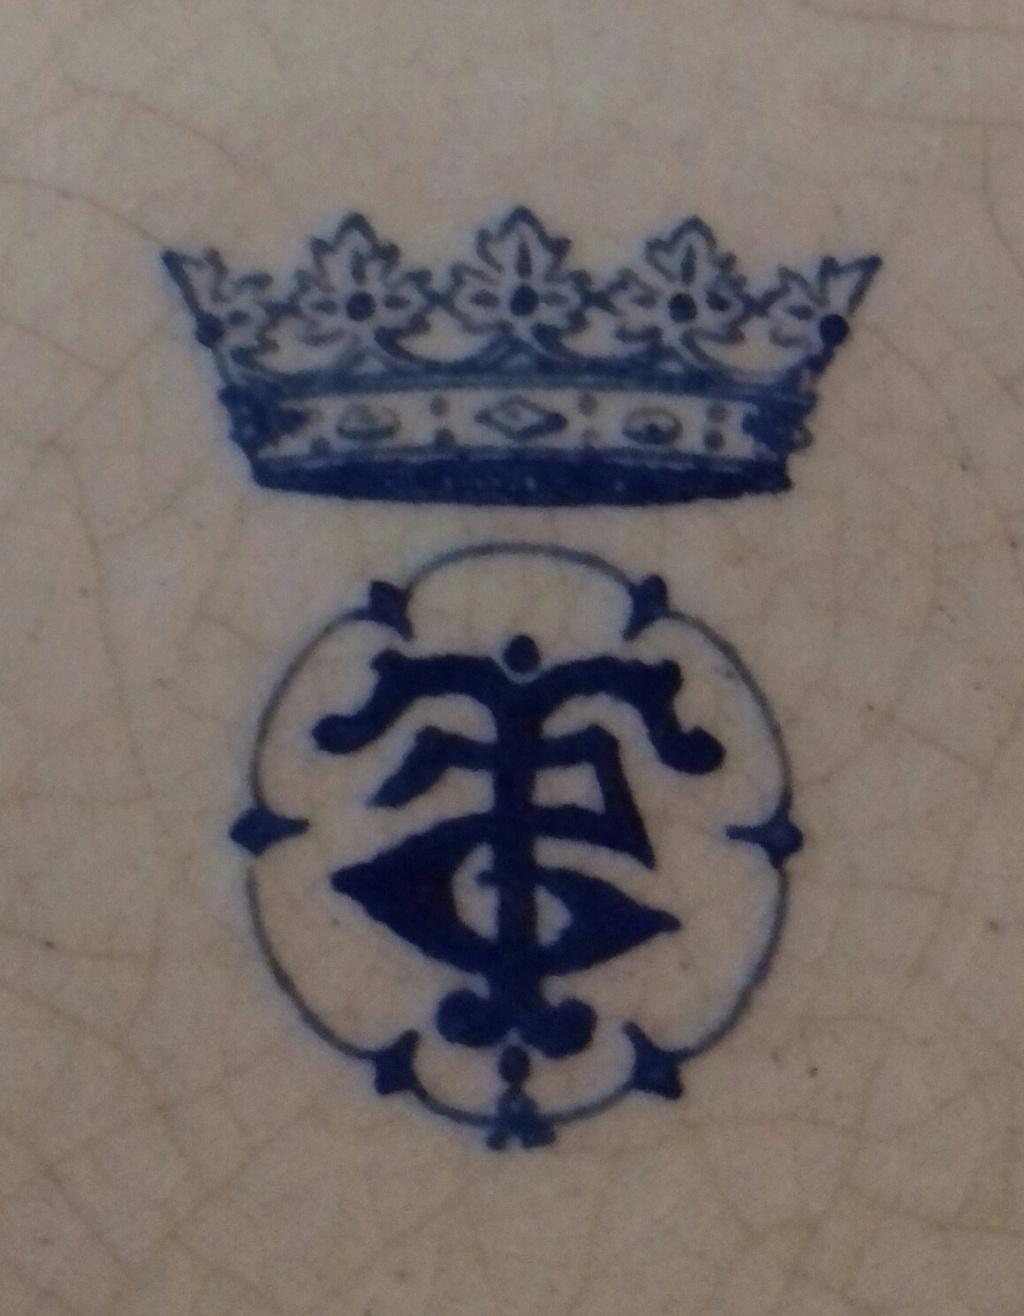 BROWN PINK TEAPOT SILVER RIM Mark under blue Crown T reverse 5 in circle 20210620